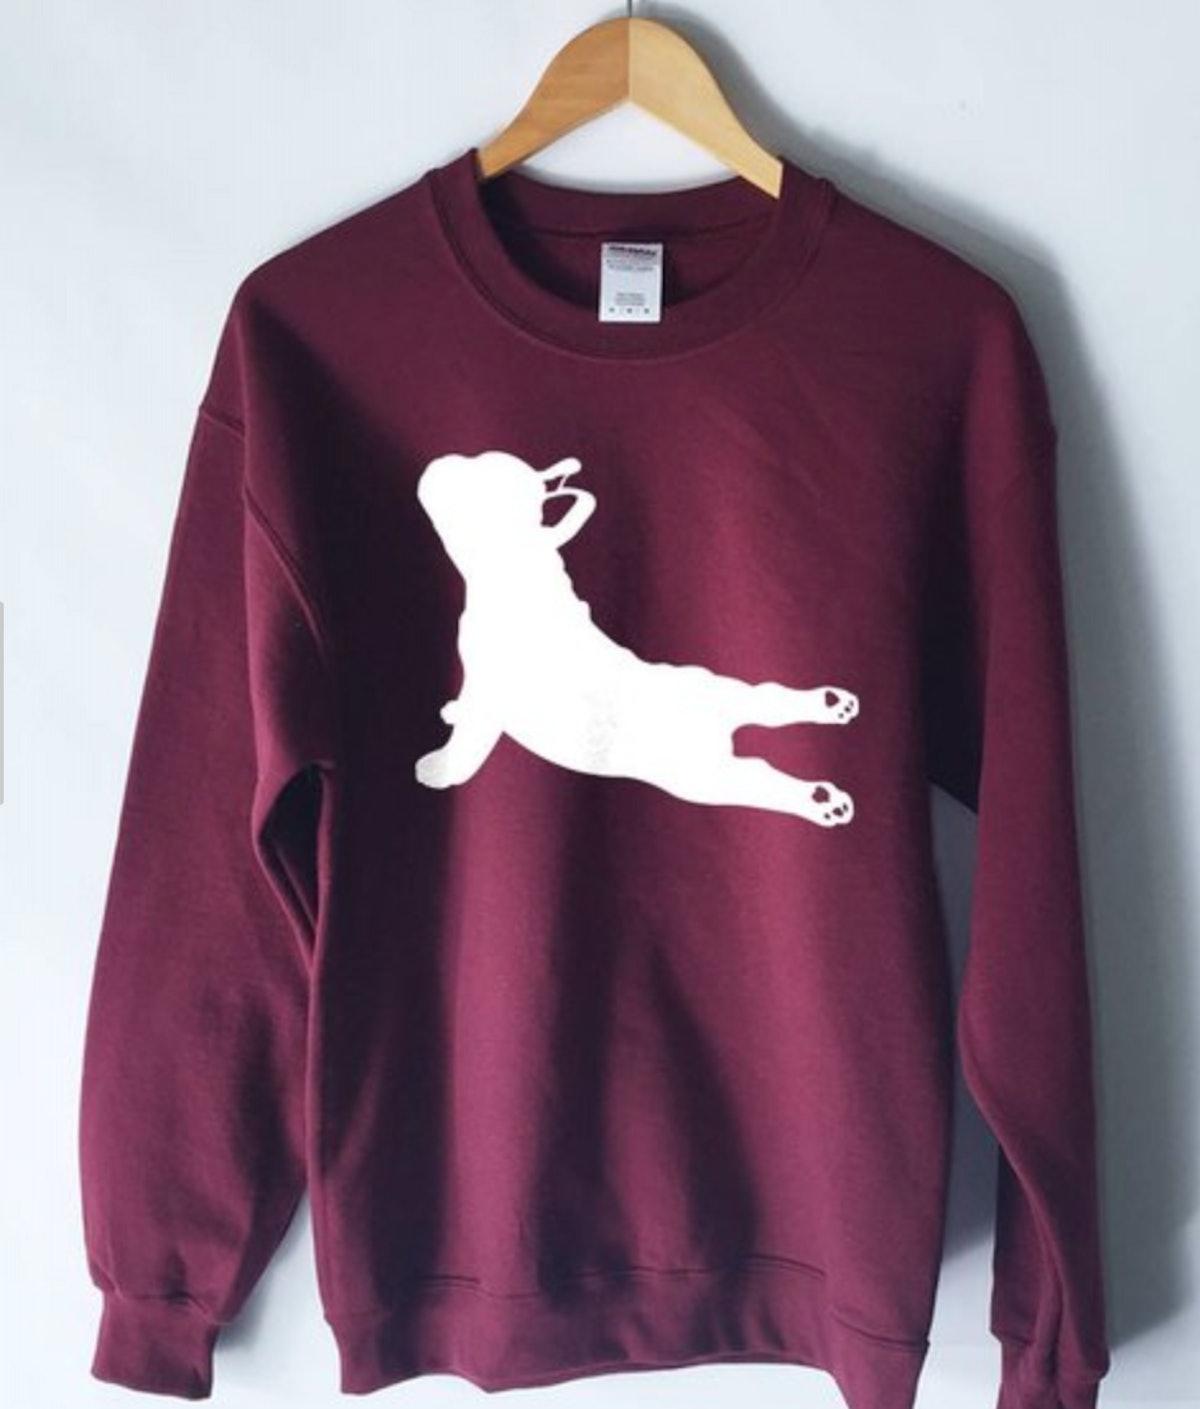 French Bulldog Yoga Pose Sweatshirt